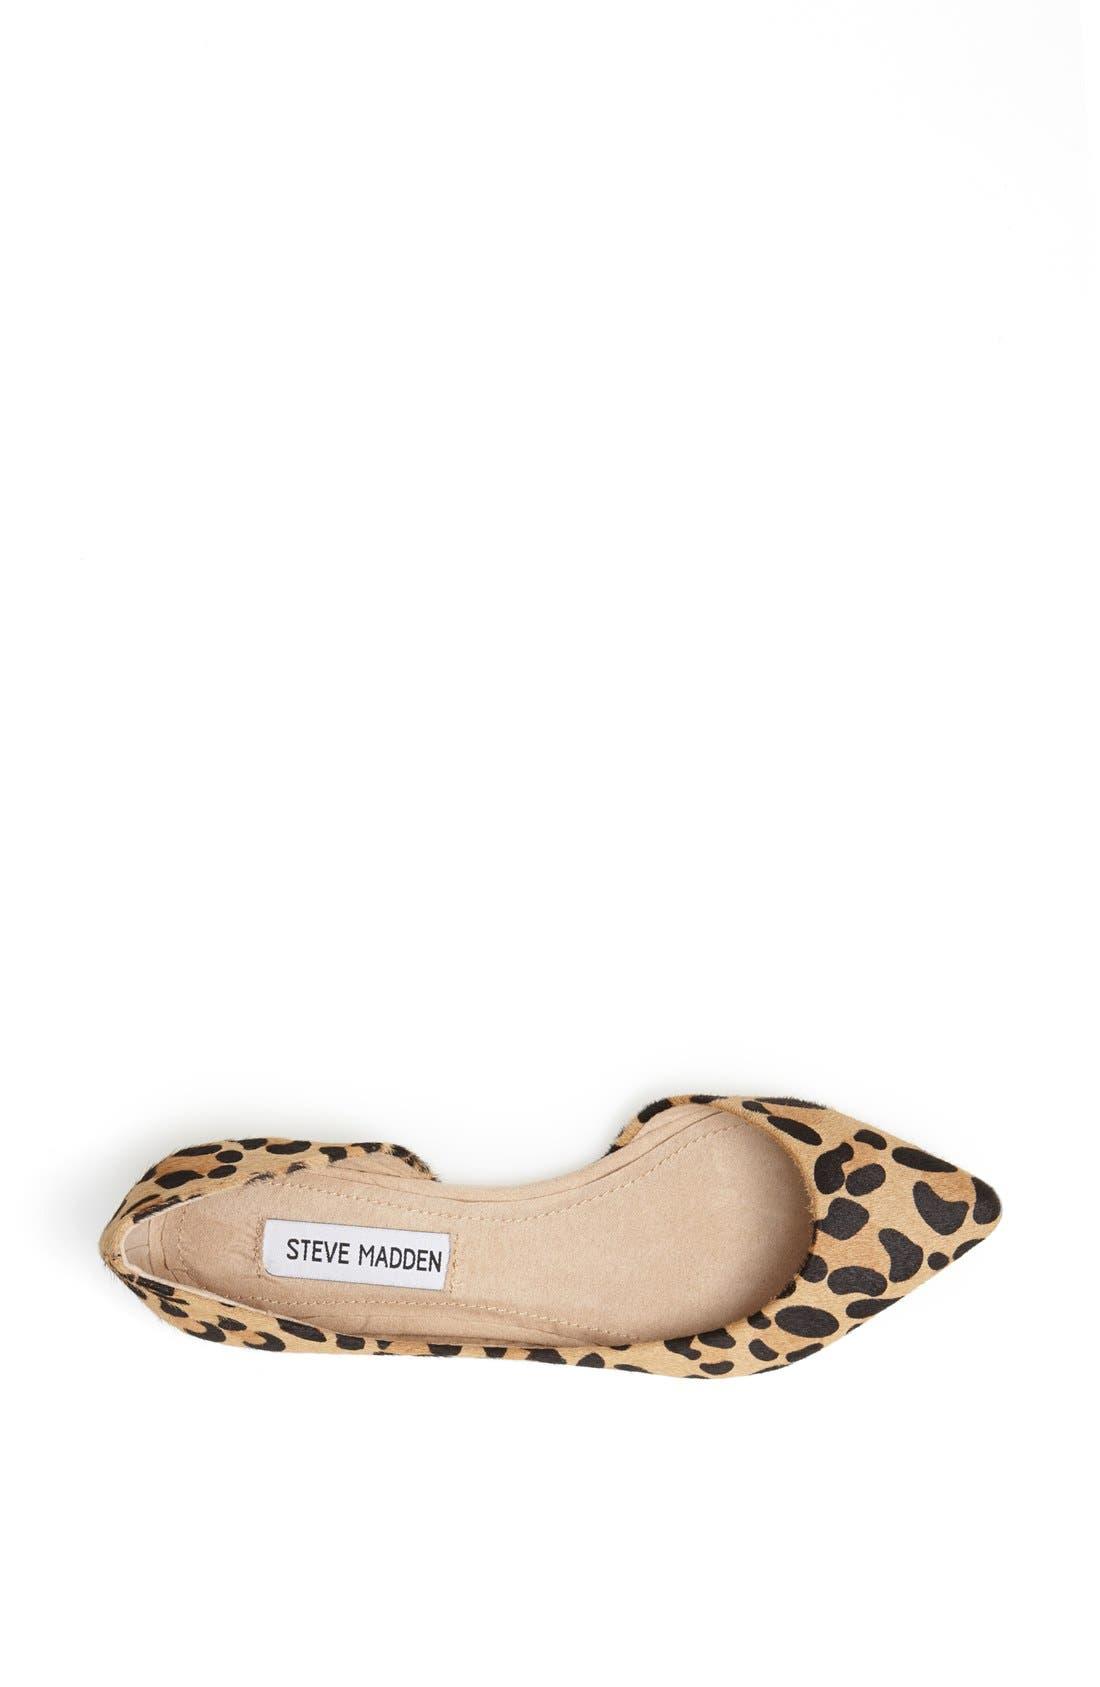 Alternate Image 3  - Steve Madden 'Elusion' Leopard Print Calf Hair Half d'Orsay Flat